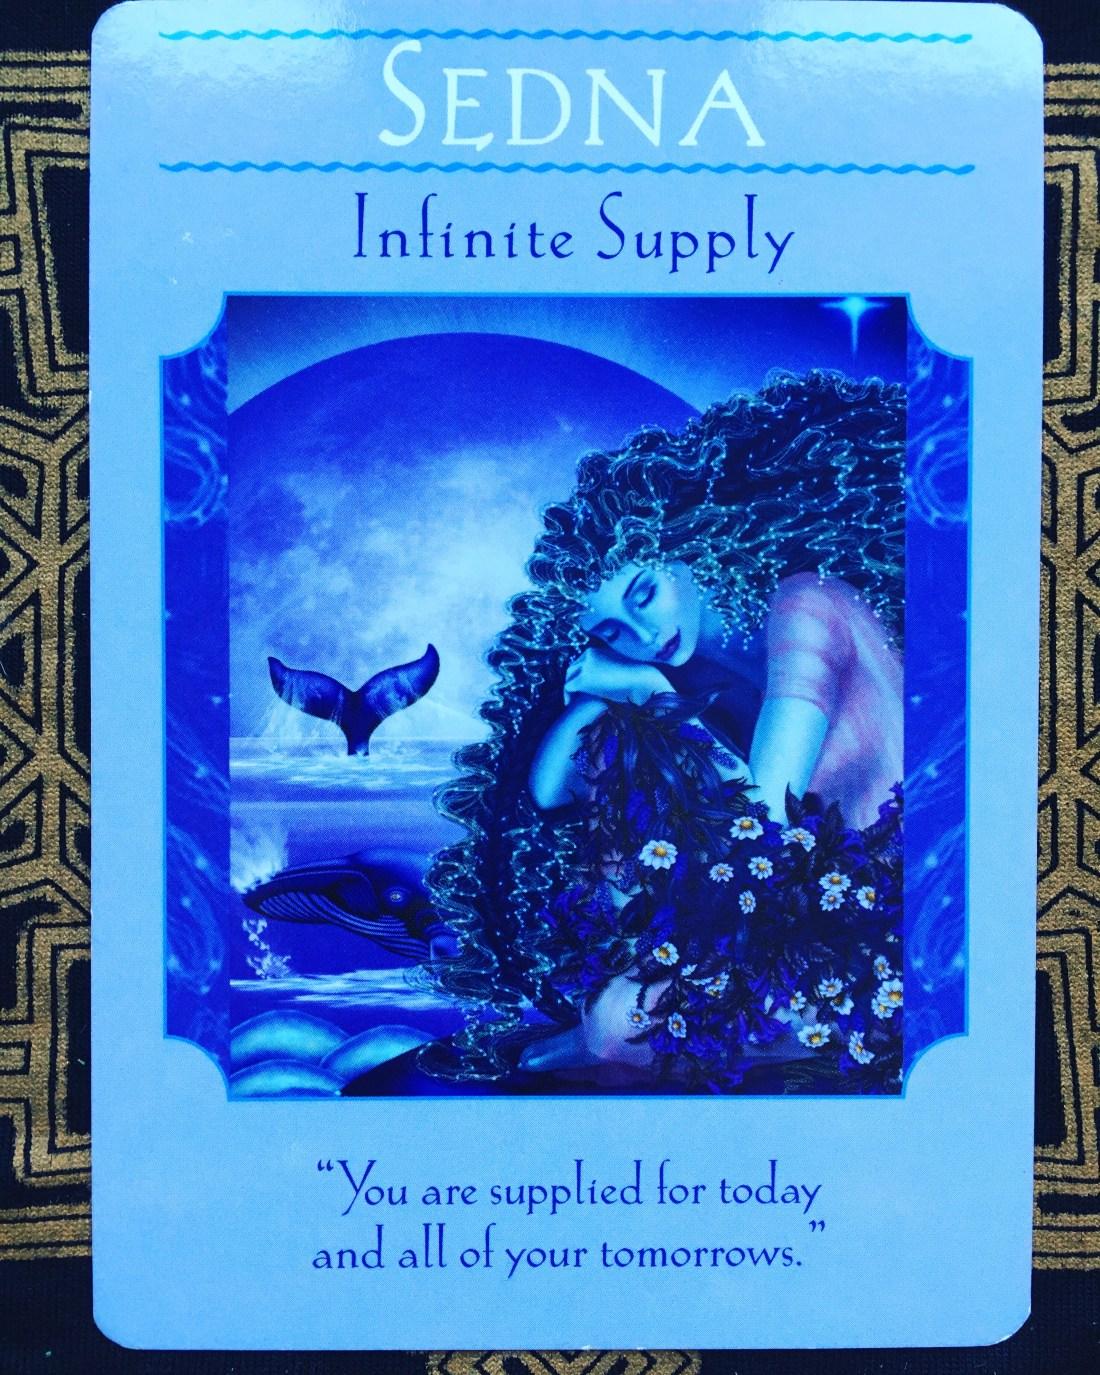 Sedna Infinite Supply